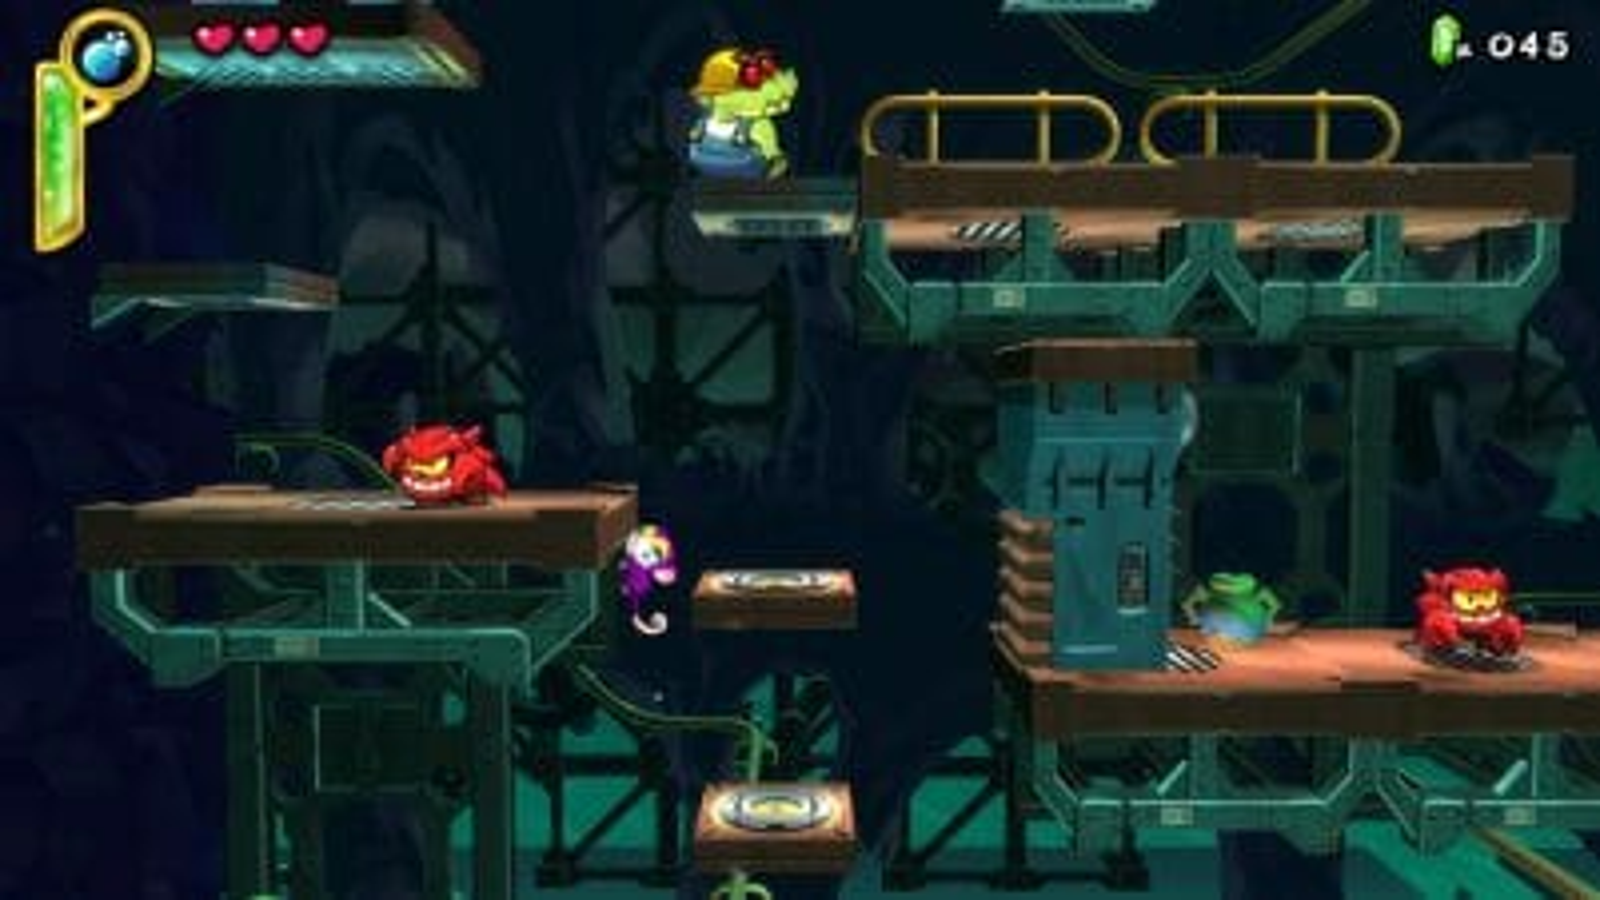 Shantae: Half-Genie Hero (Ps4) Review 10